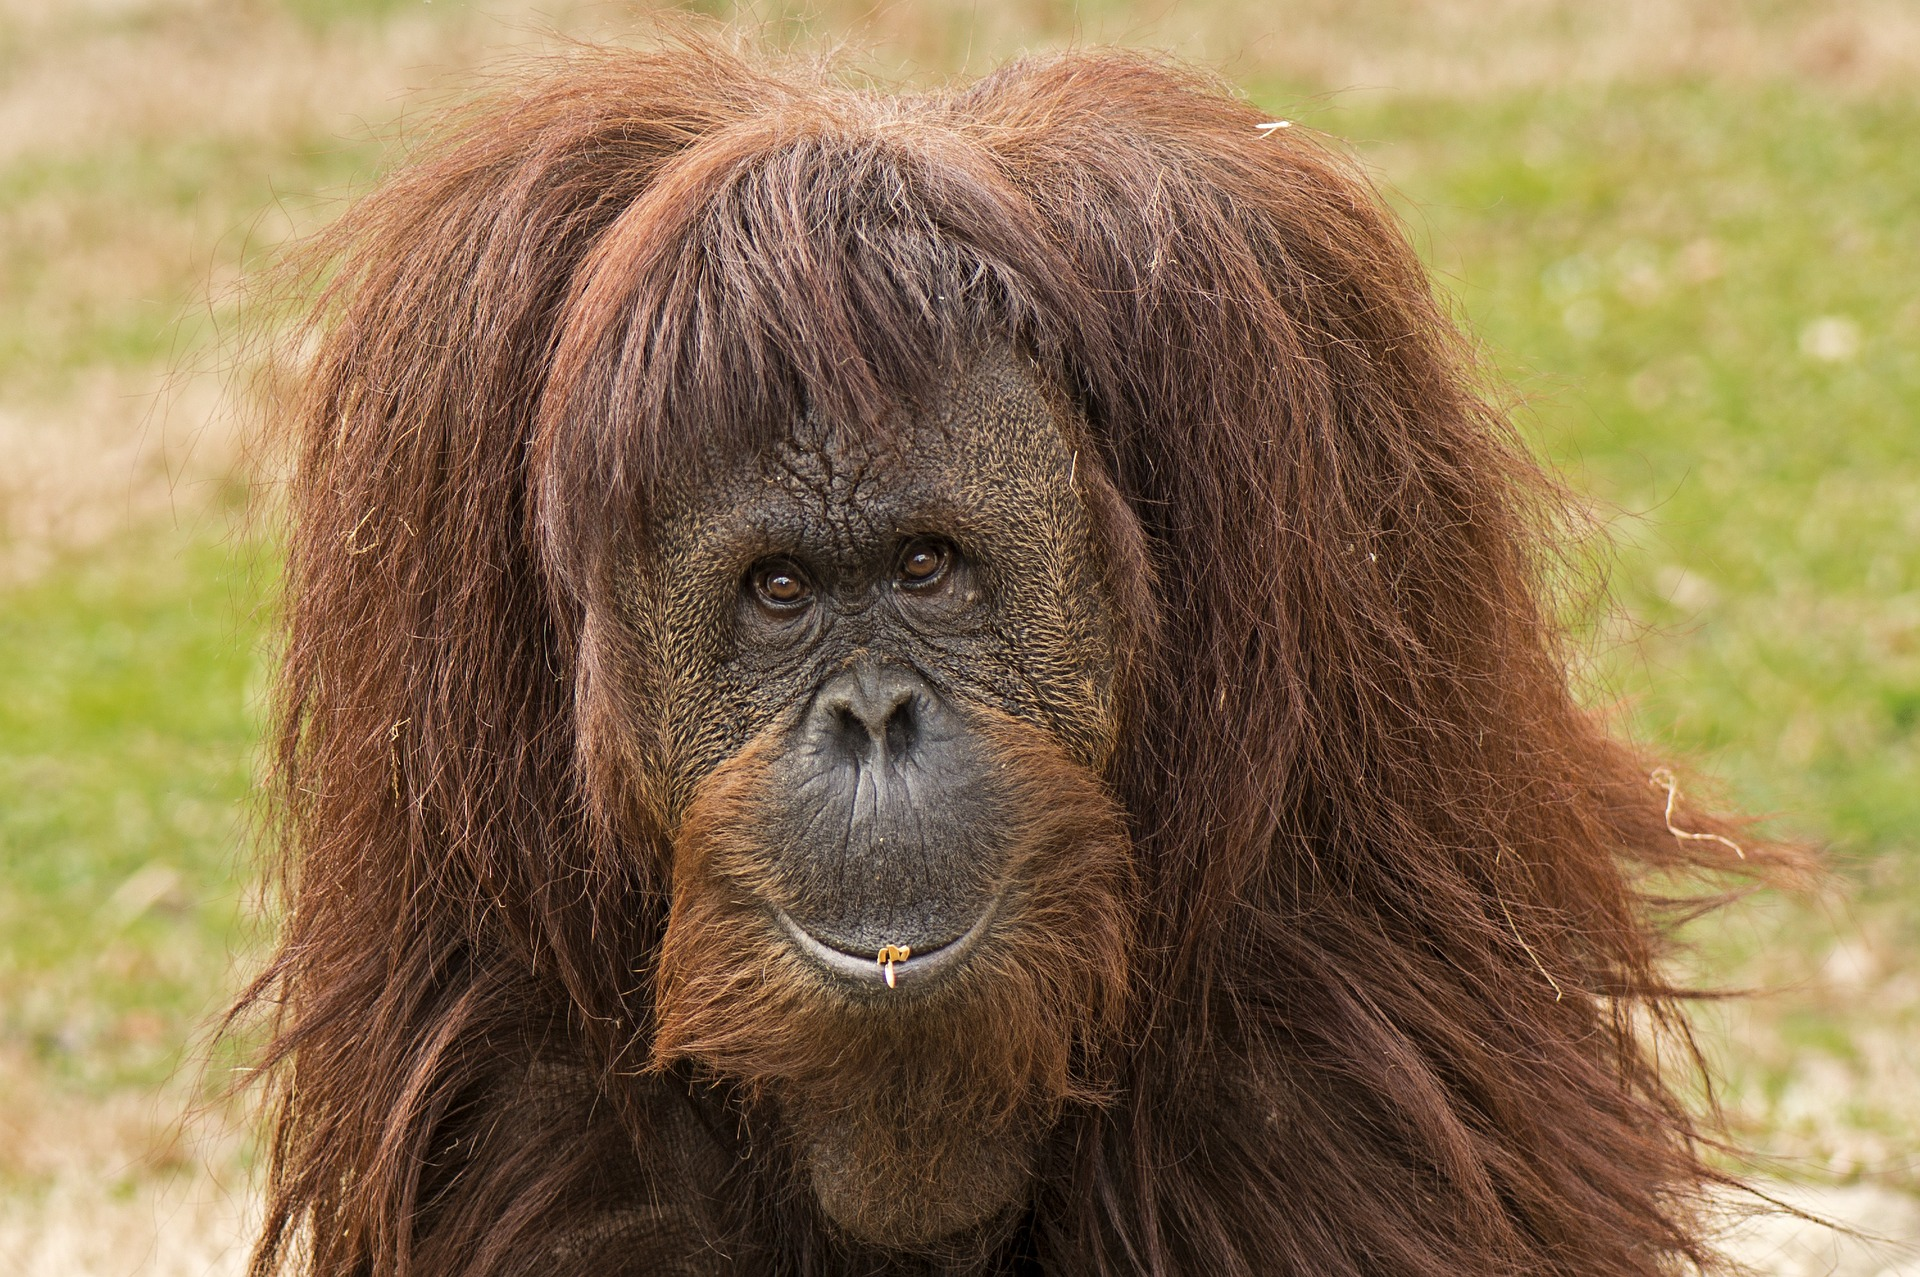 Orangutan Conservancy uses drones to monitor orangutans in Indonesia